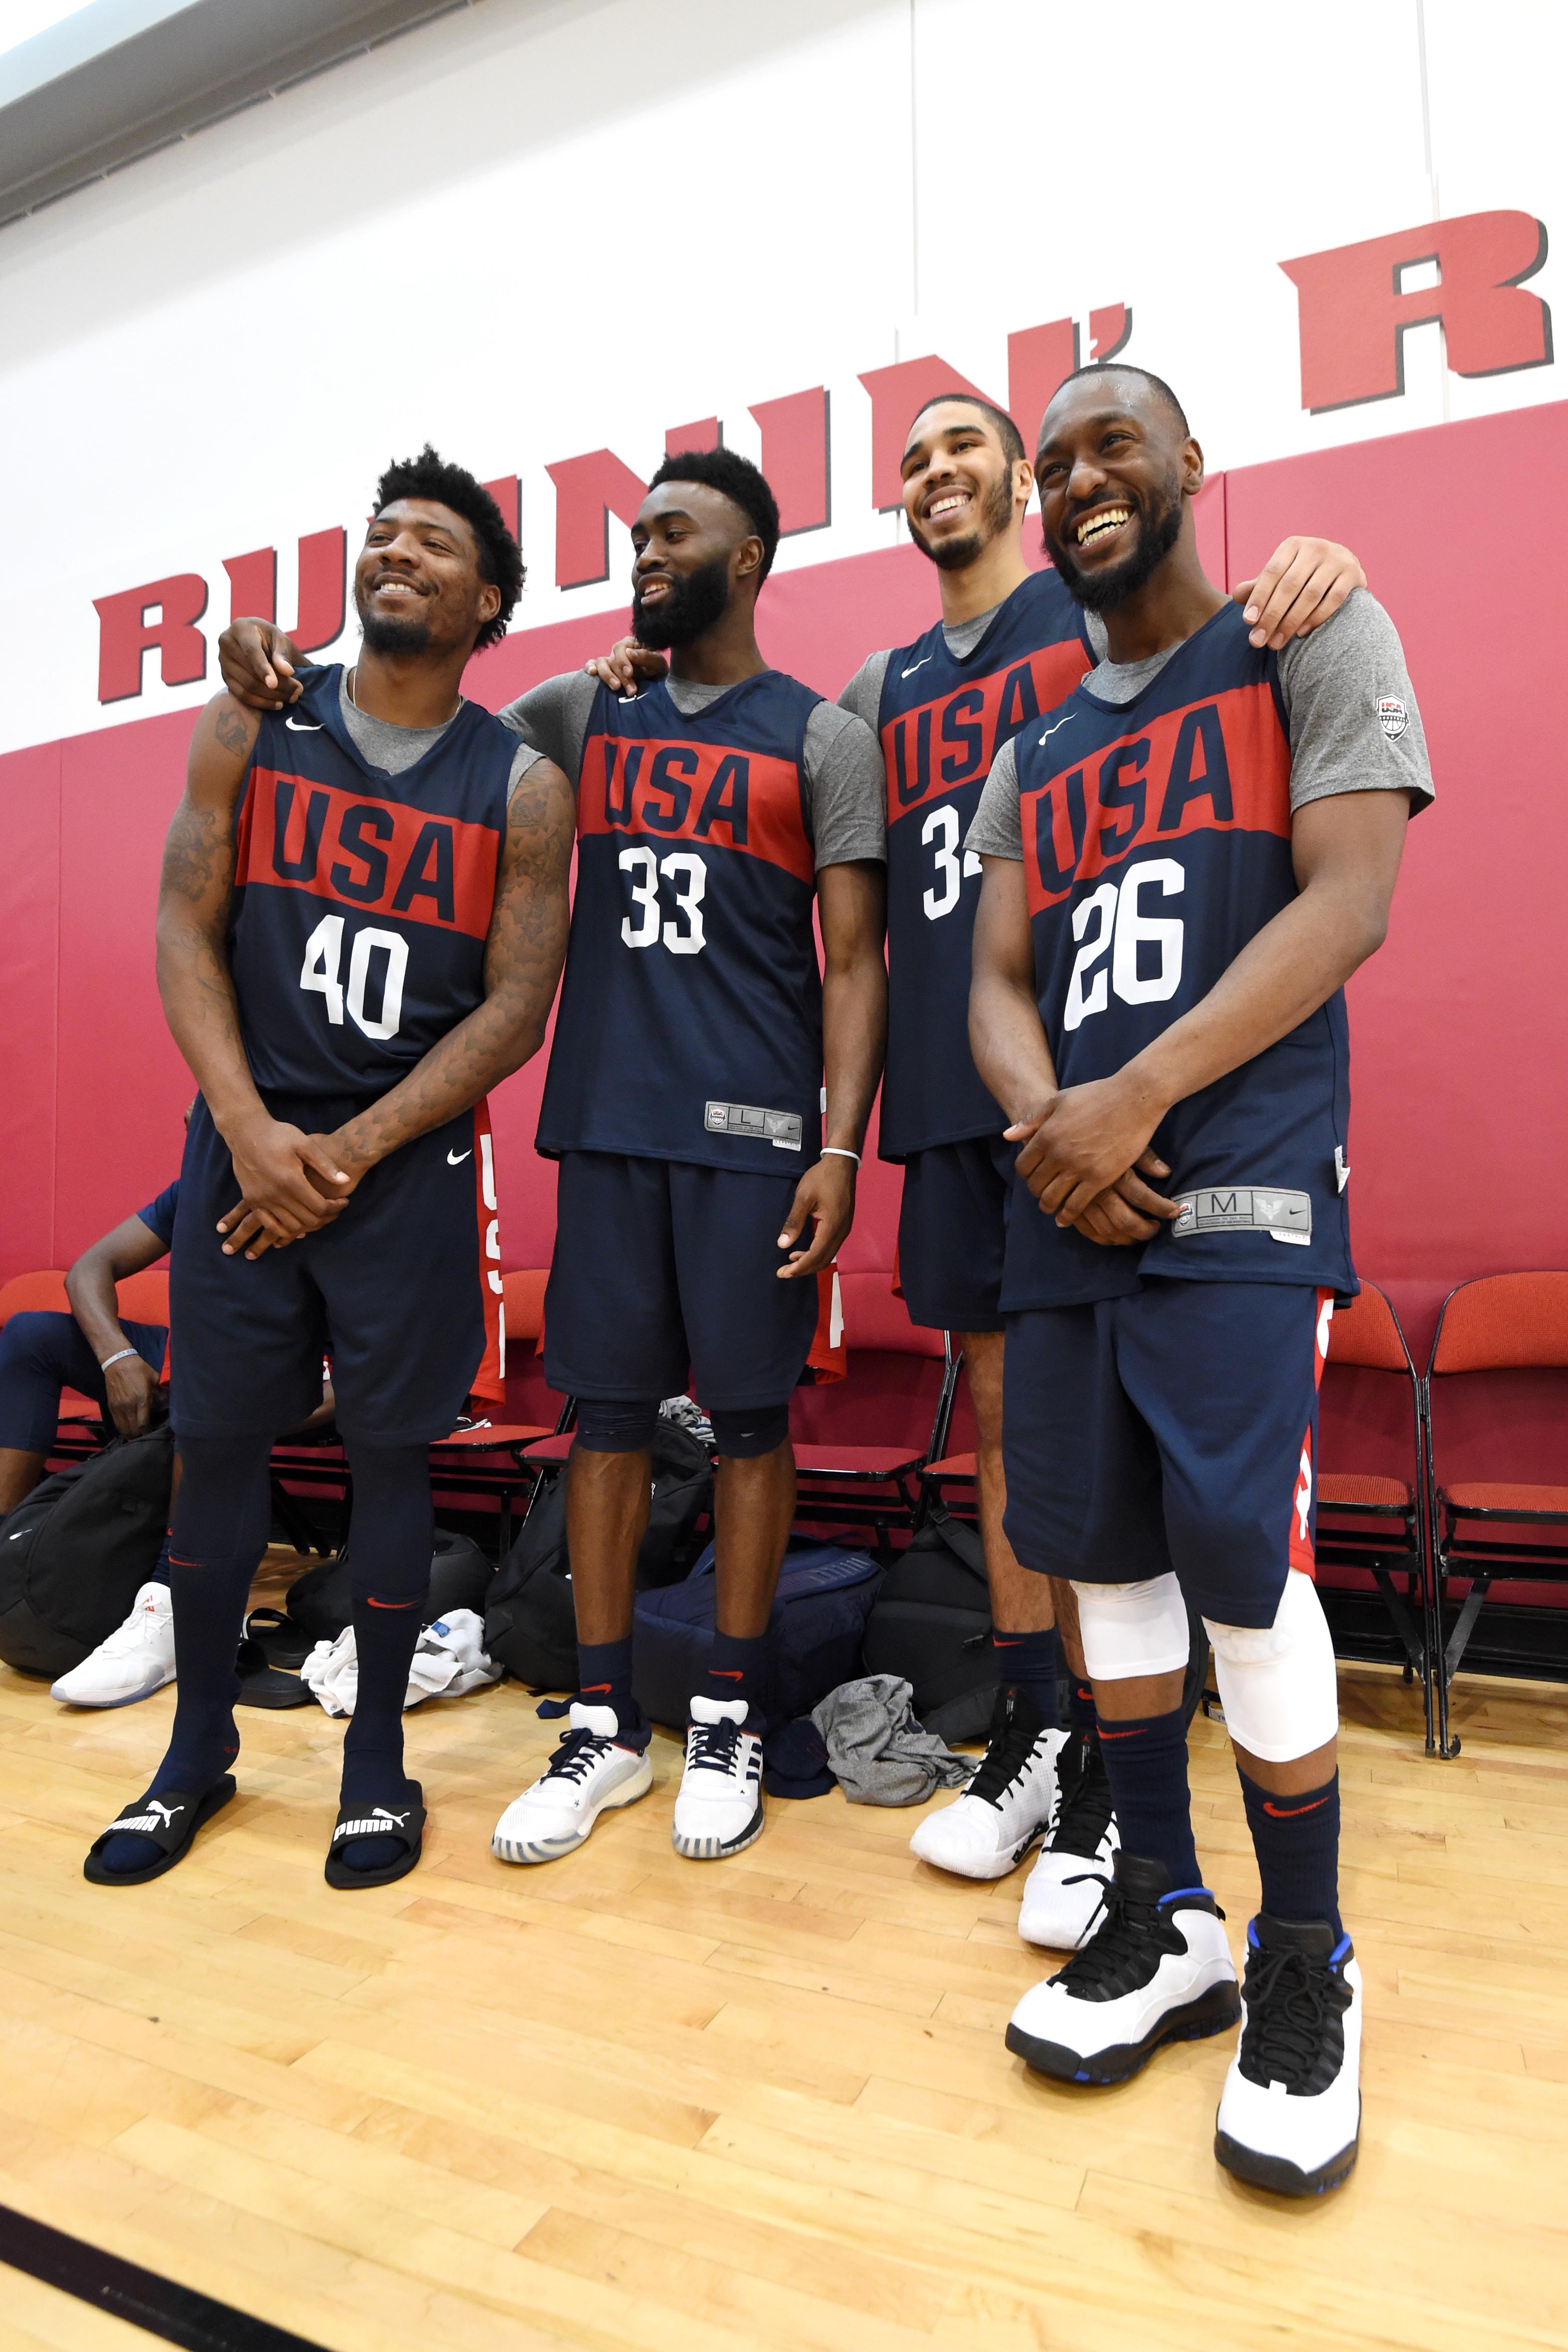 2019 USA Basketball Men's National Team Training Camp - Las Vegas